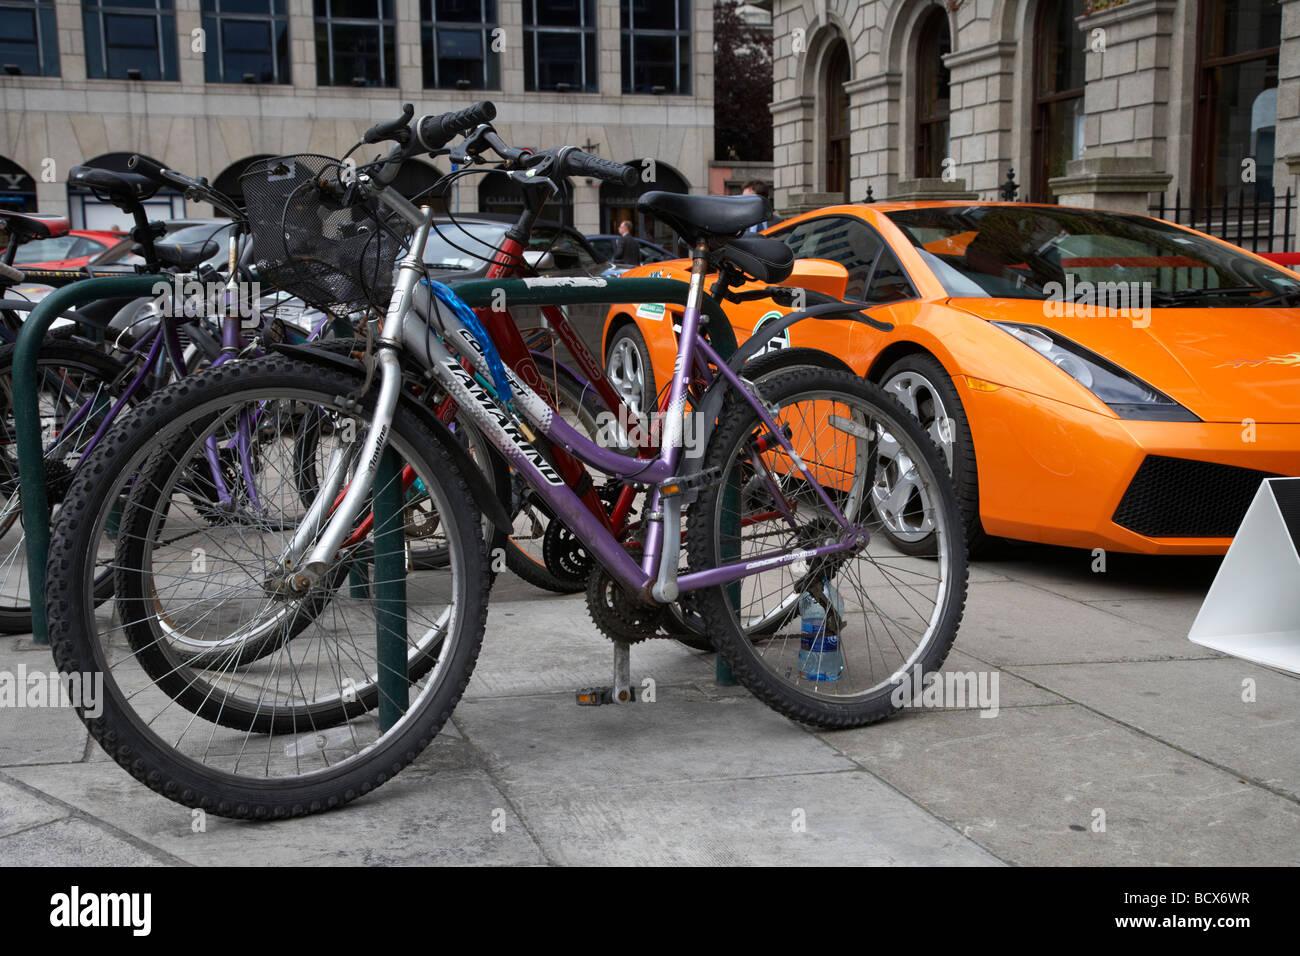 Lamborghini Sportwagen geparkt auf Bürgersteig neben Reihe Fahrräder Dublin, Republik Irland Stockbild